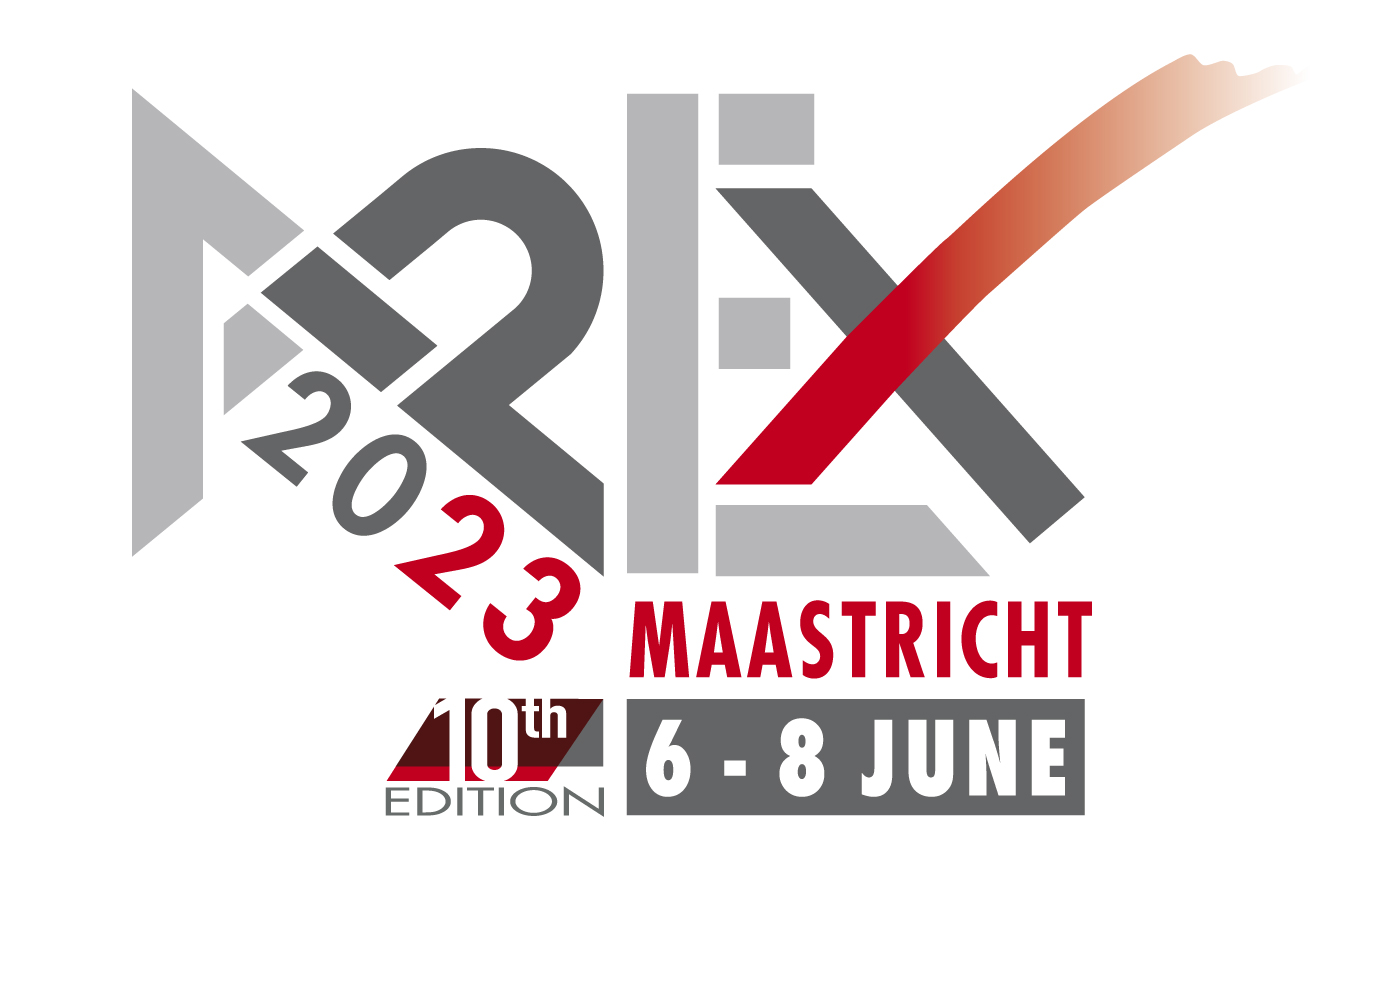 APEX SHOW 2023 - Maastricht, The Netherlands